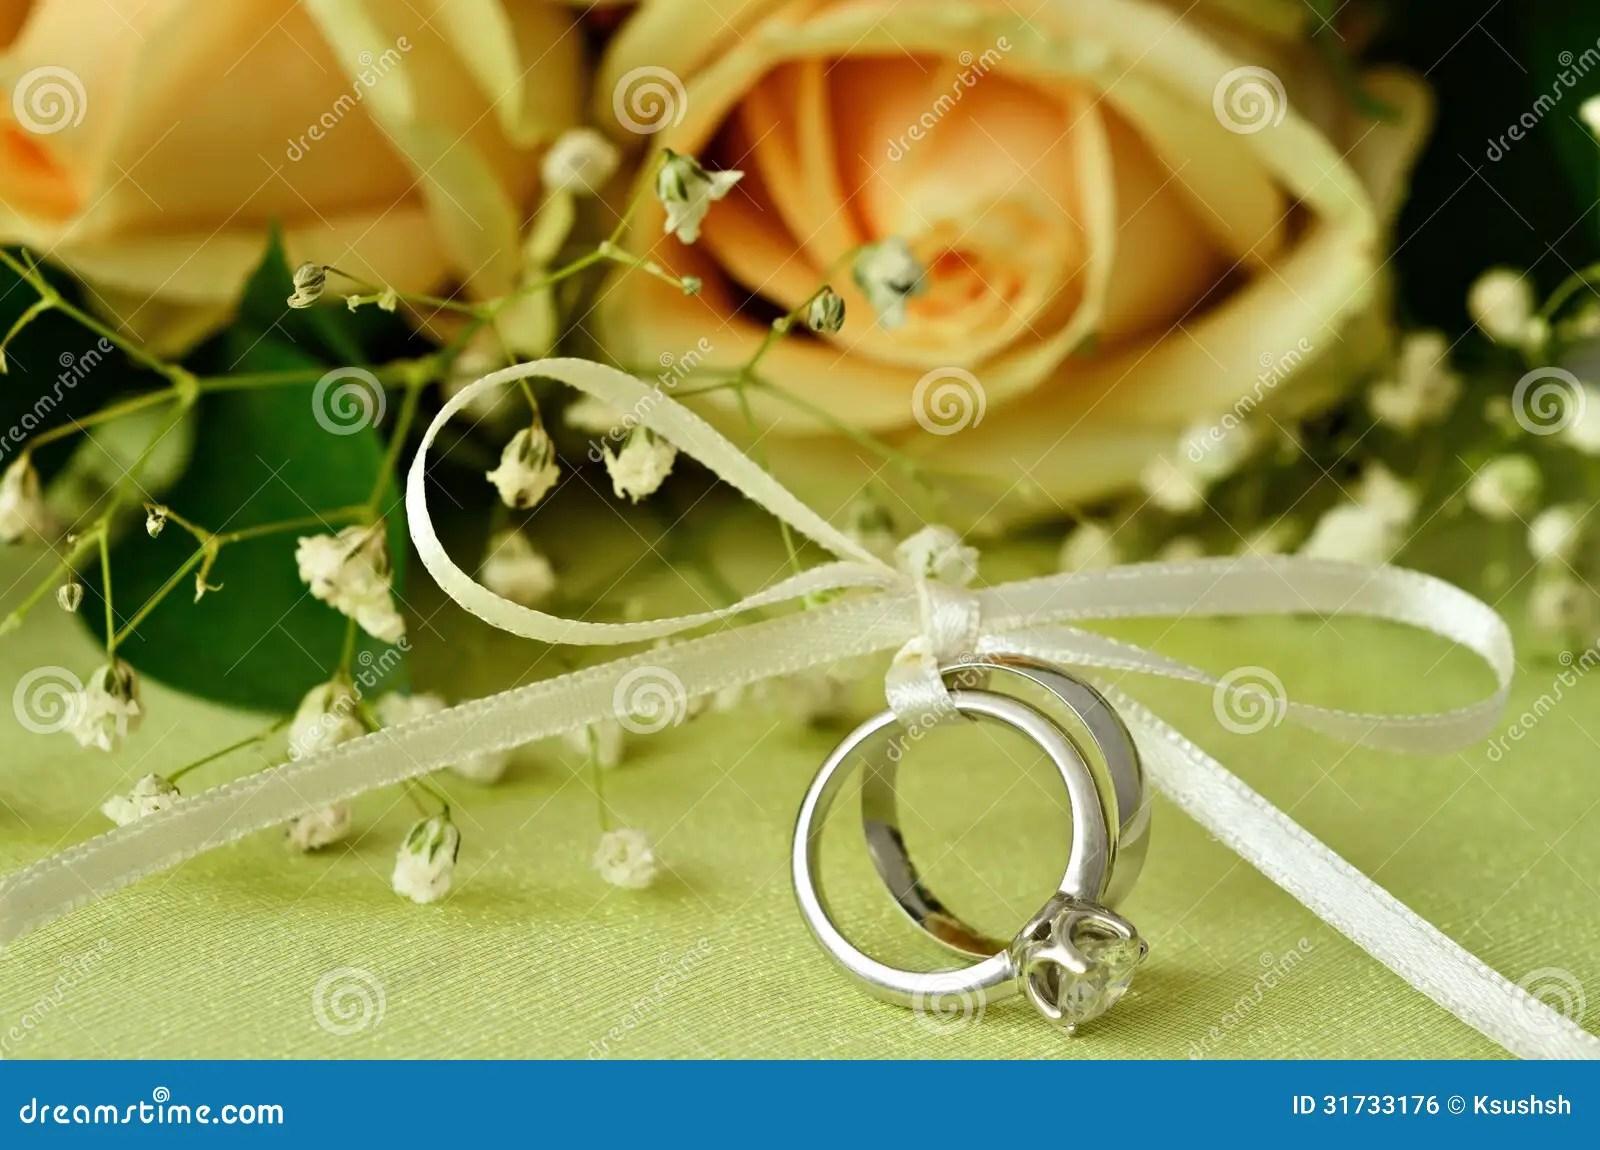 royalty free stock photos gold wedding rings orange roses ribbon image orange wedding rings Bouquet of roses and wedding rings Royalty Free Stock Image